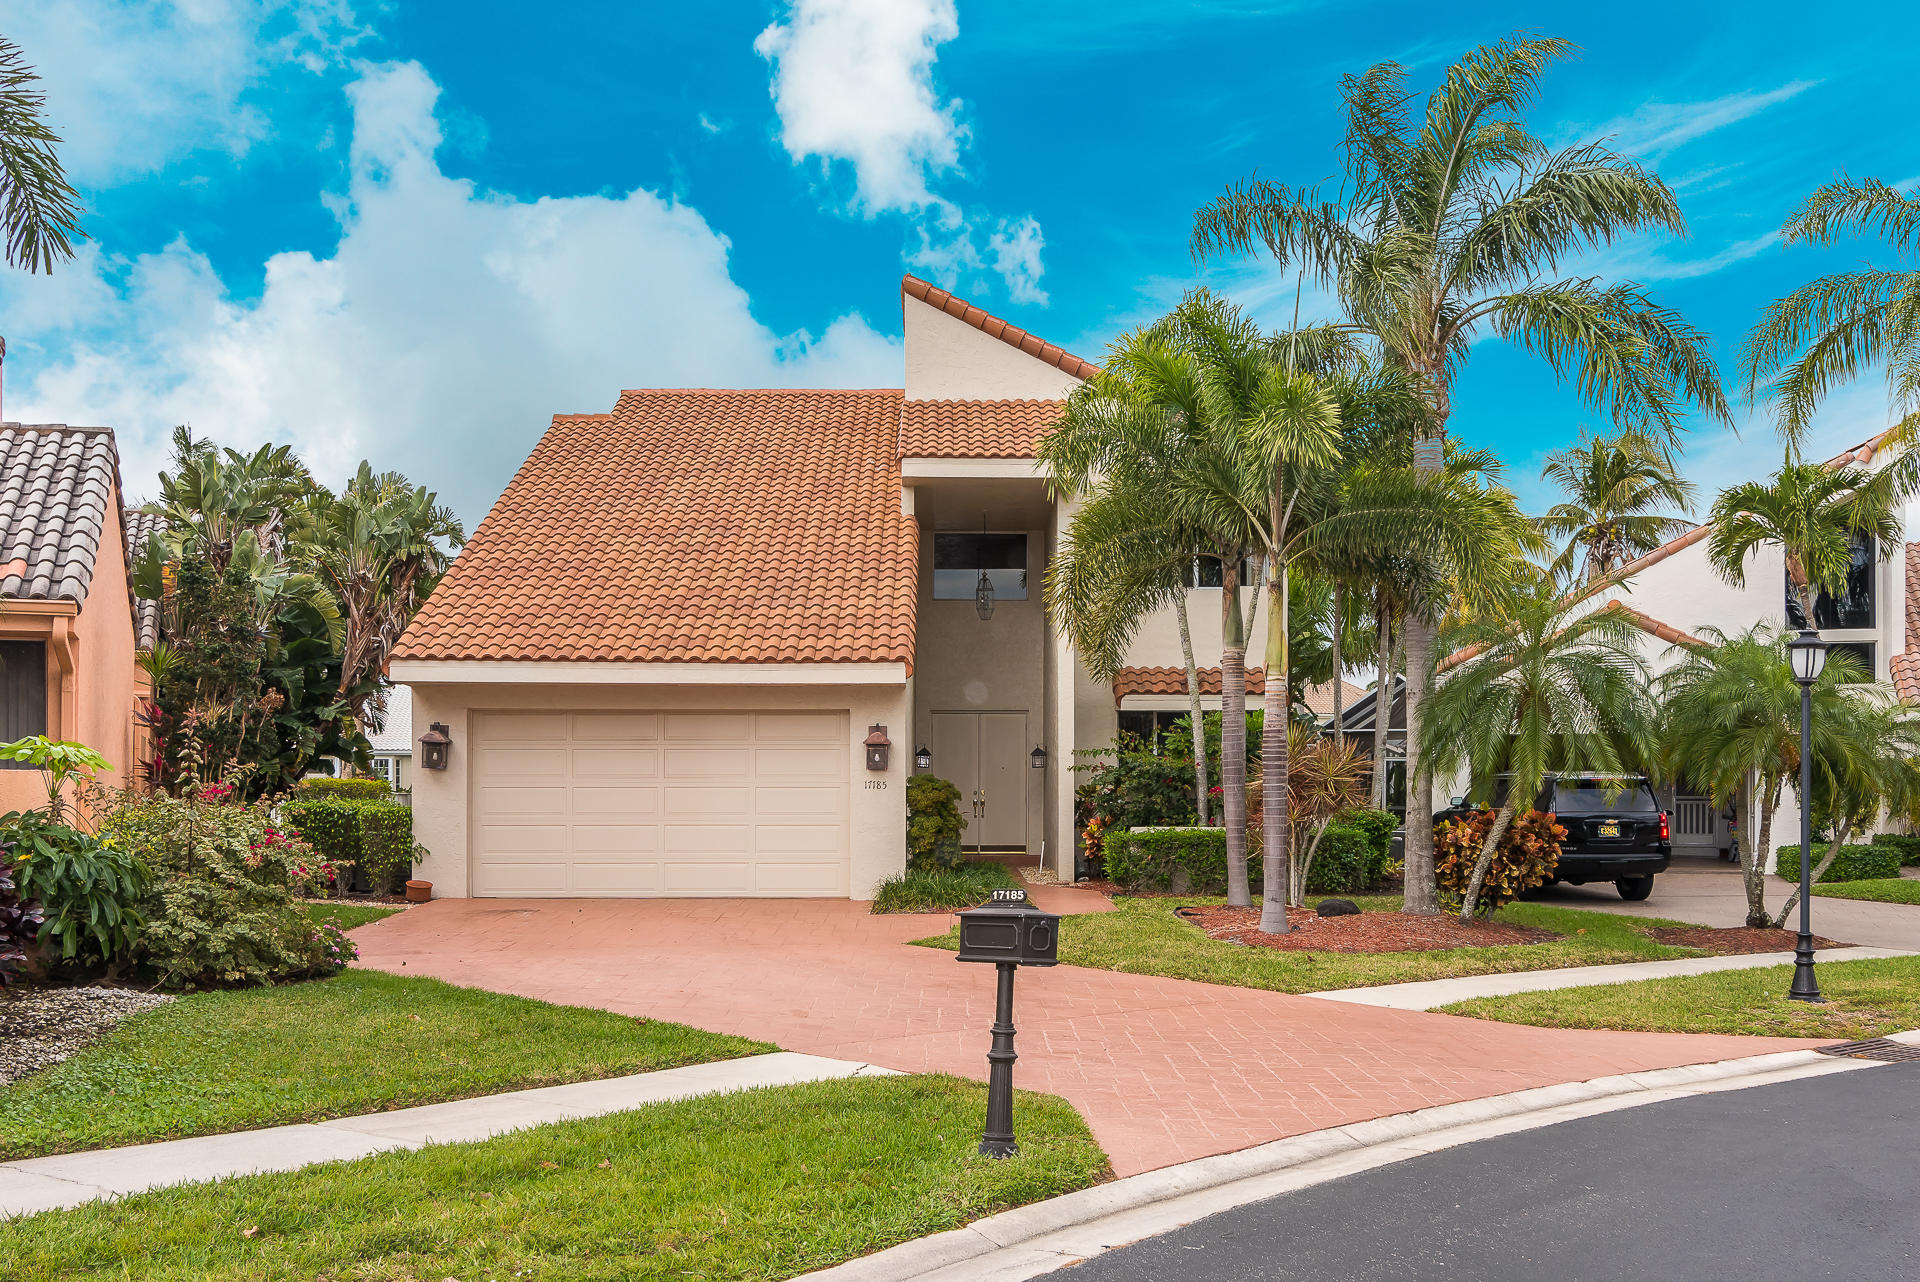 17185 Newport Club Drive, Boca Raton, FL 33496